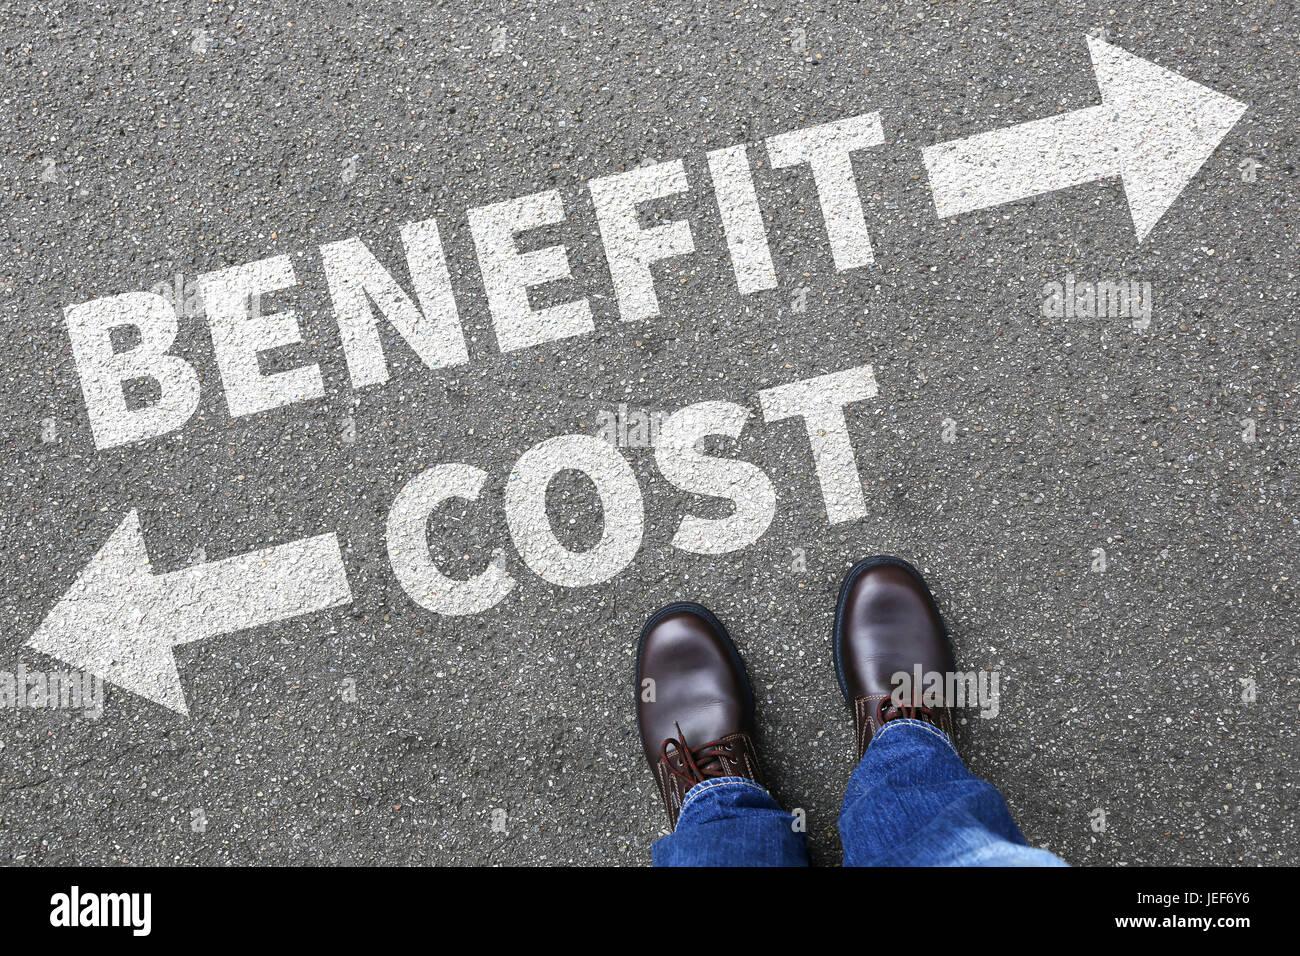 Cost benefit loss profit finances financial success company business concept - Stock Image